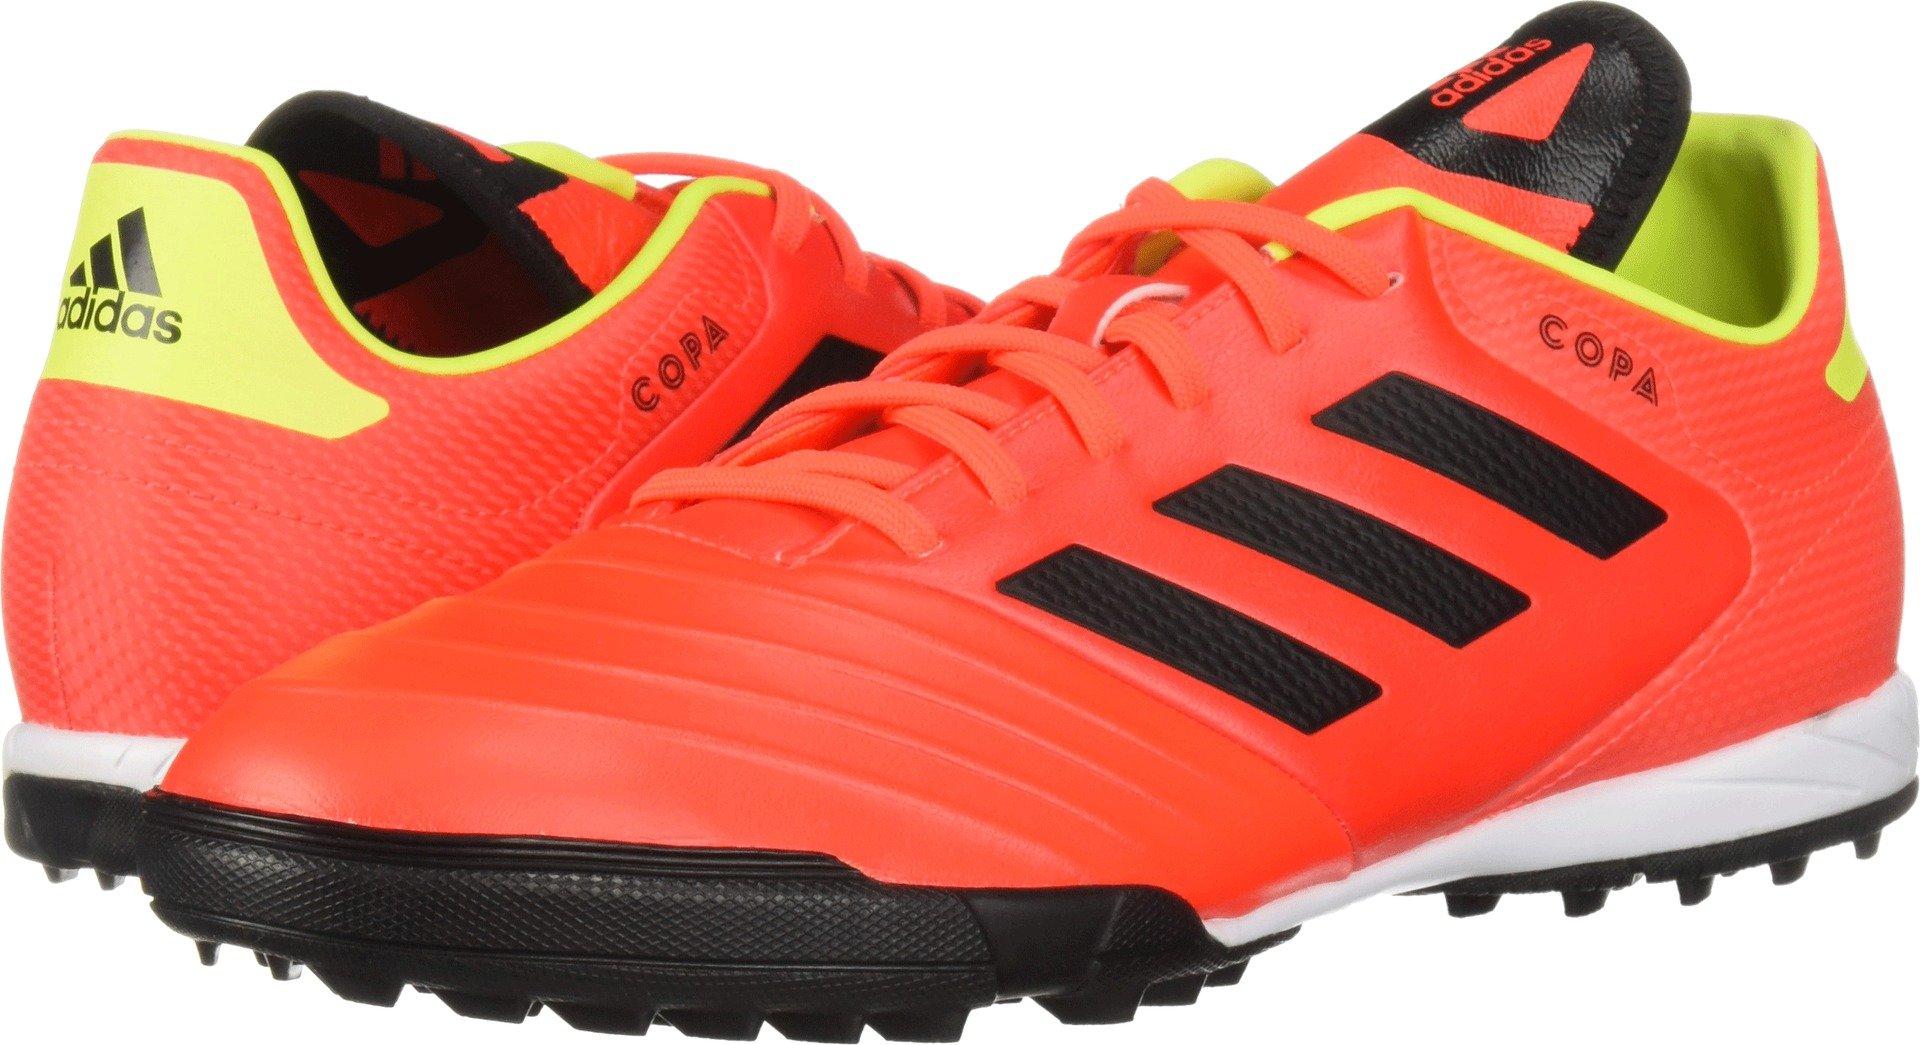 adidas Men's Copa Tango 18.3 Turf Soccer Shoe, Solar Red/Black/Solar Yellow, 9.5 M US